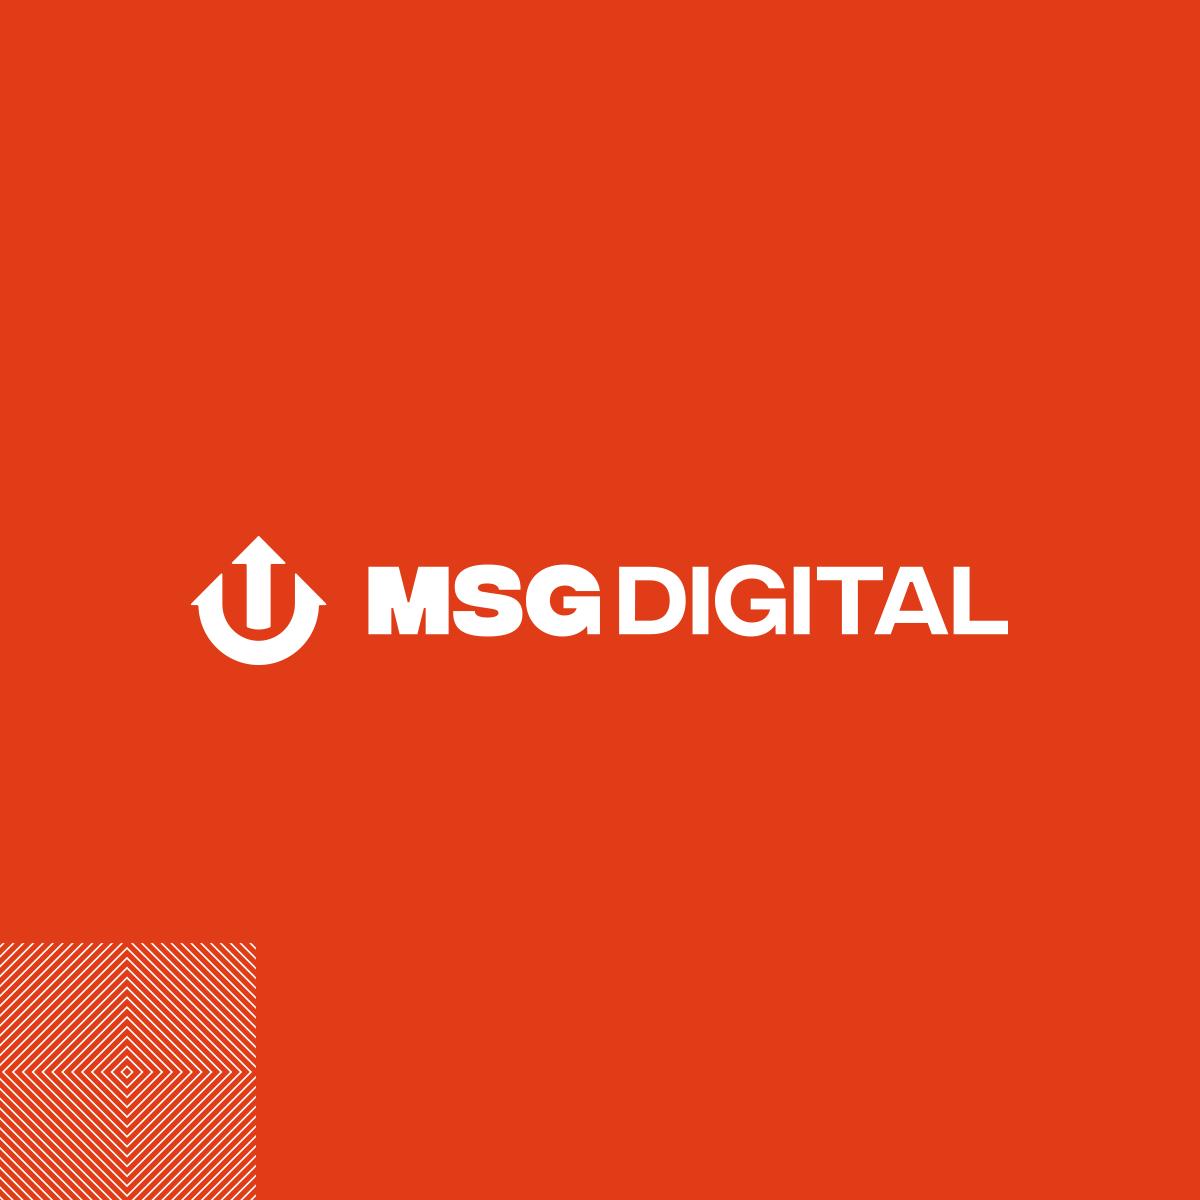 MSG Digital